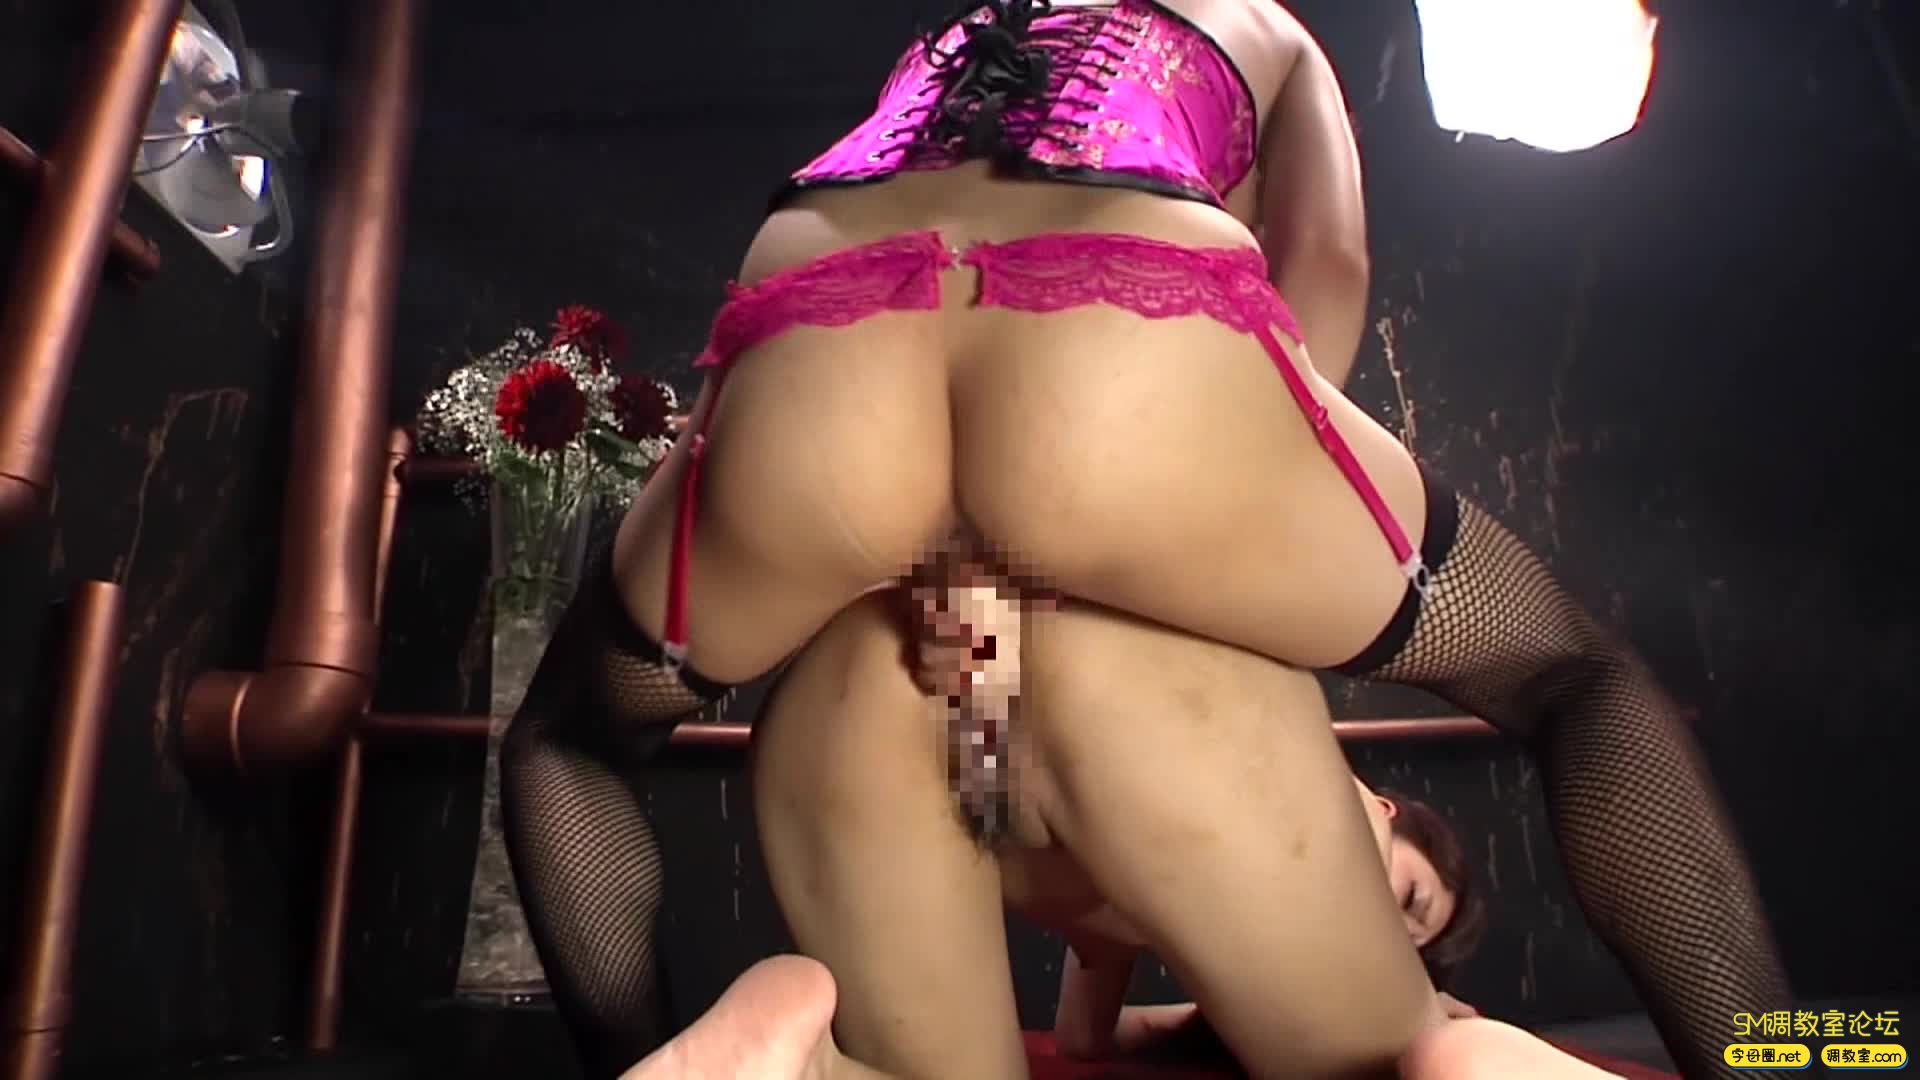 [Dogma合集] - DDT-416 - 第一集 - 拘束フィストレズビアン みづなれい 美咲結衣-视频截图8